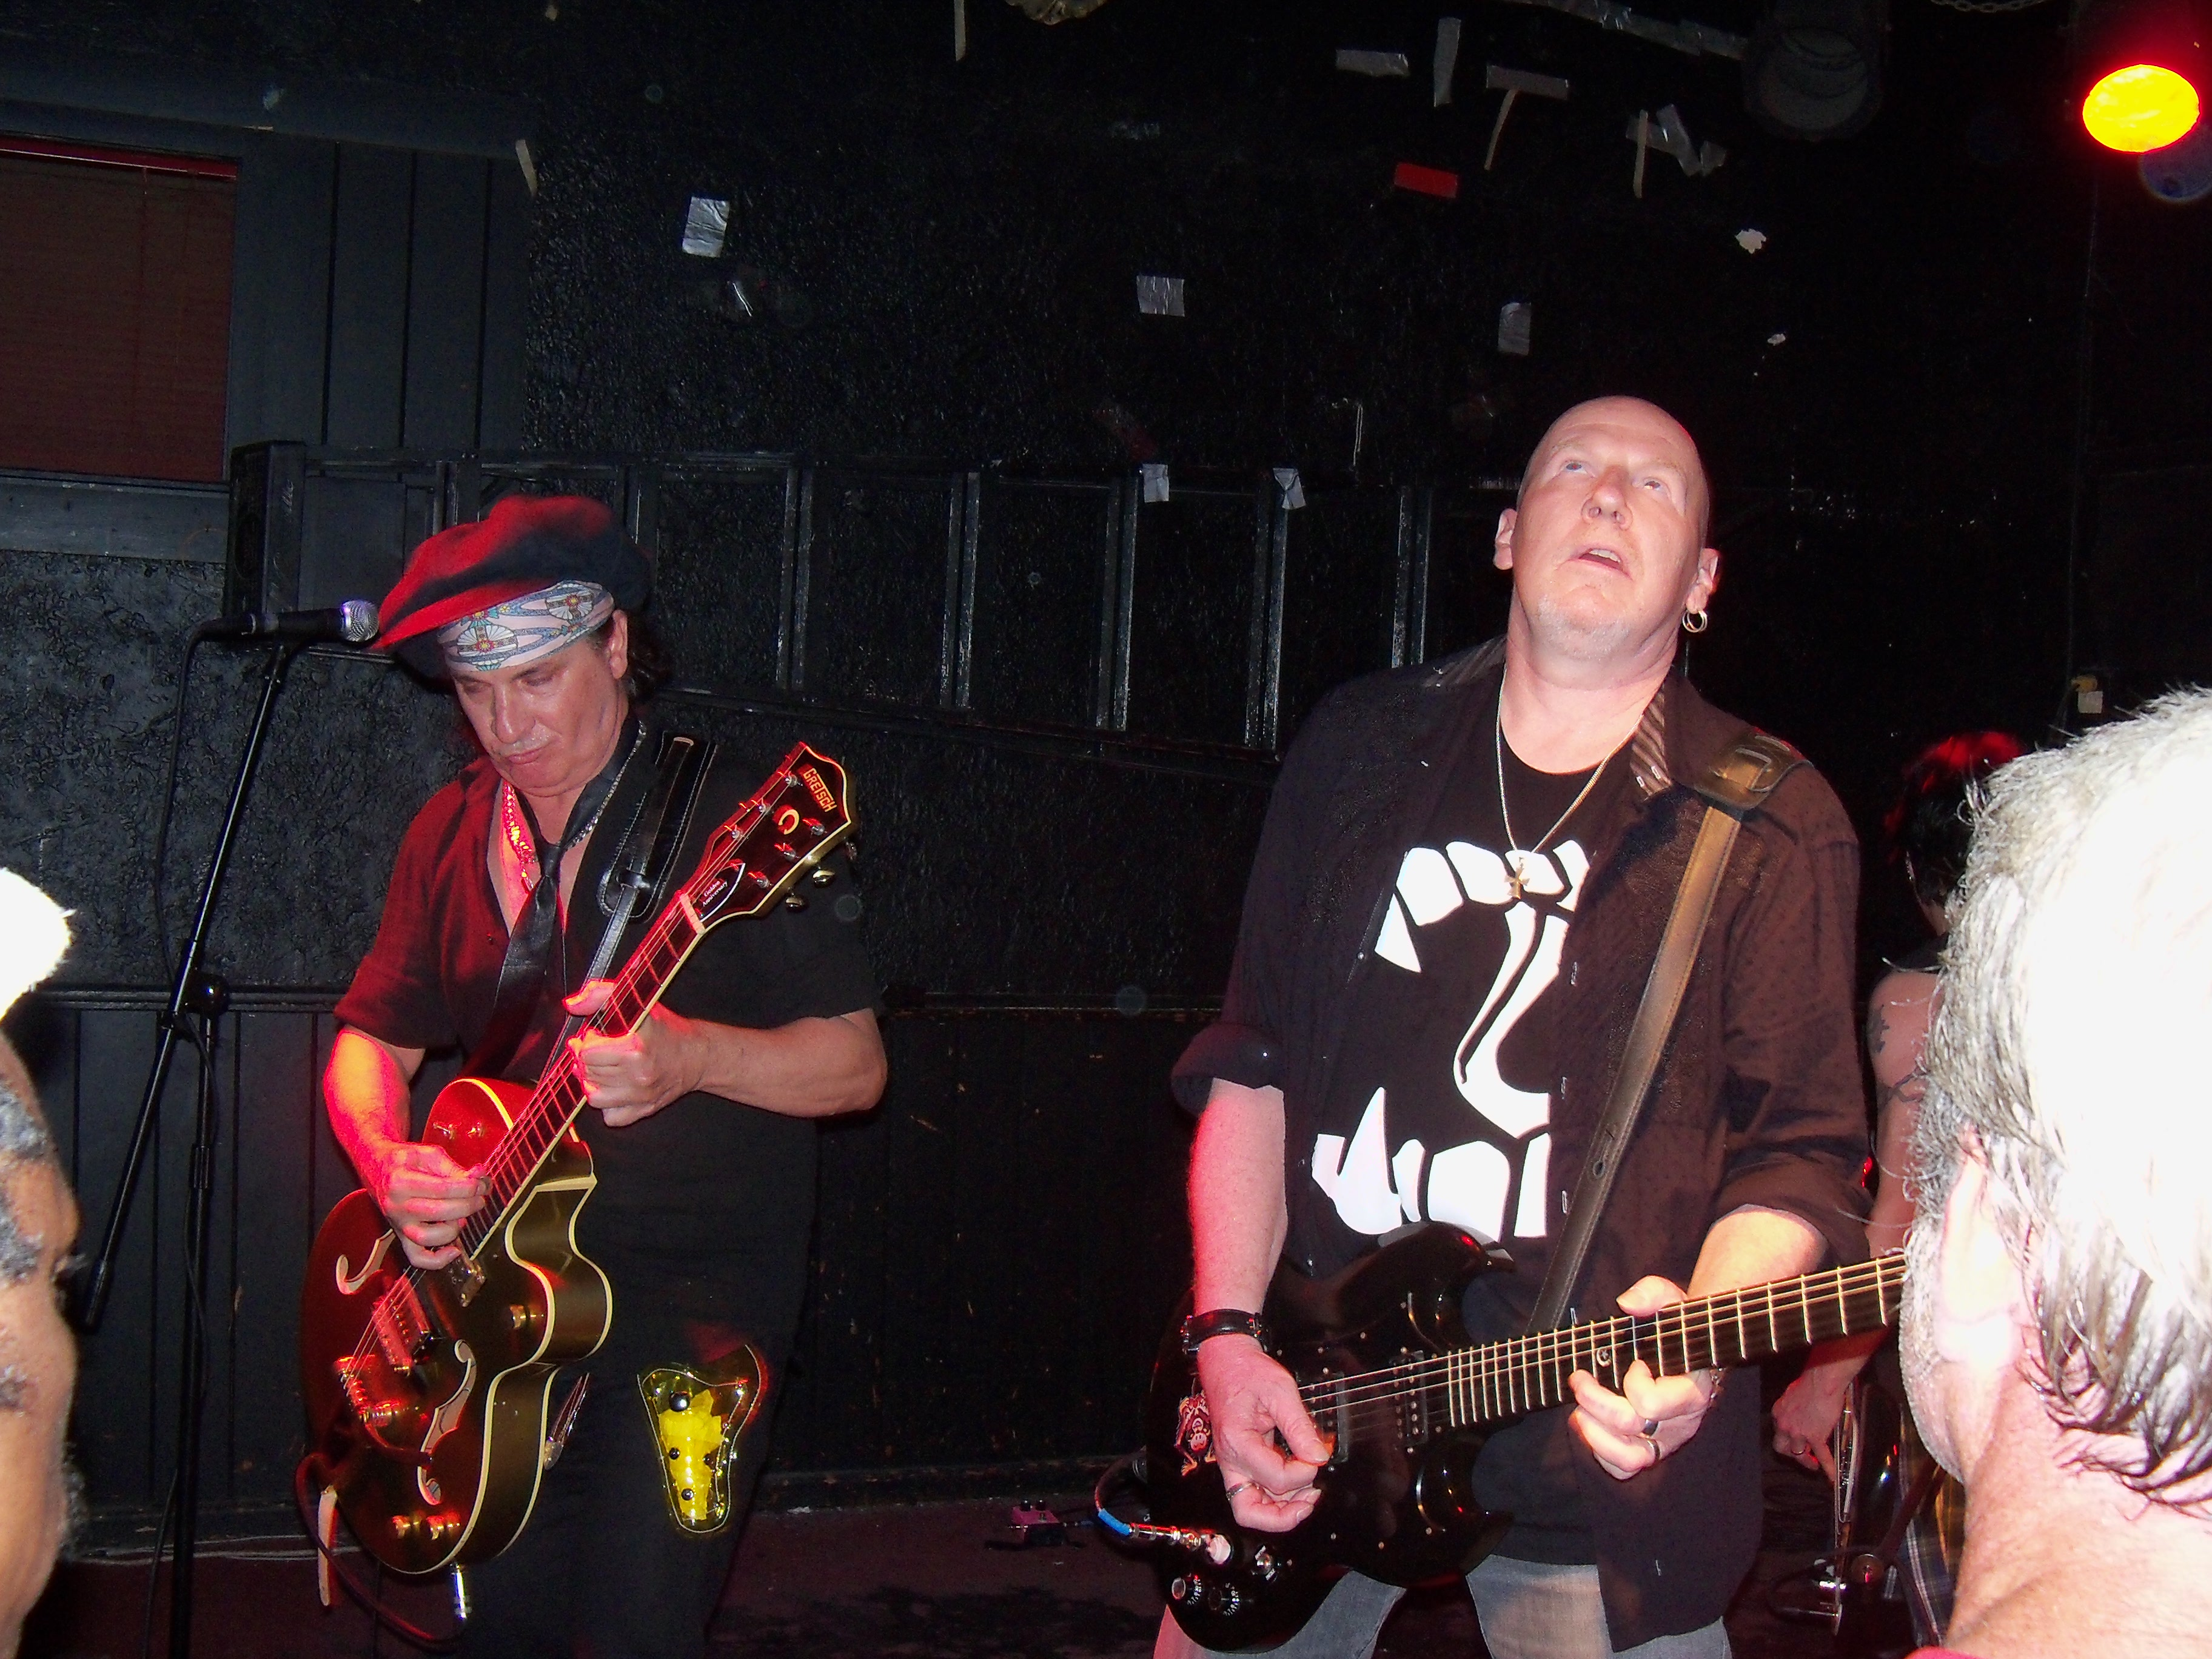 Punk Royalty Sylvain Sylvain and Cheetah Chrome Rock Brighton Bar (7/24/10)  | Speak Into My Good Eye